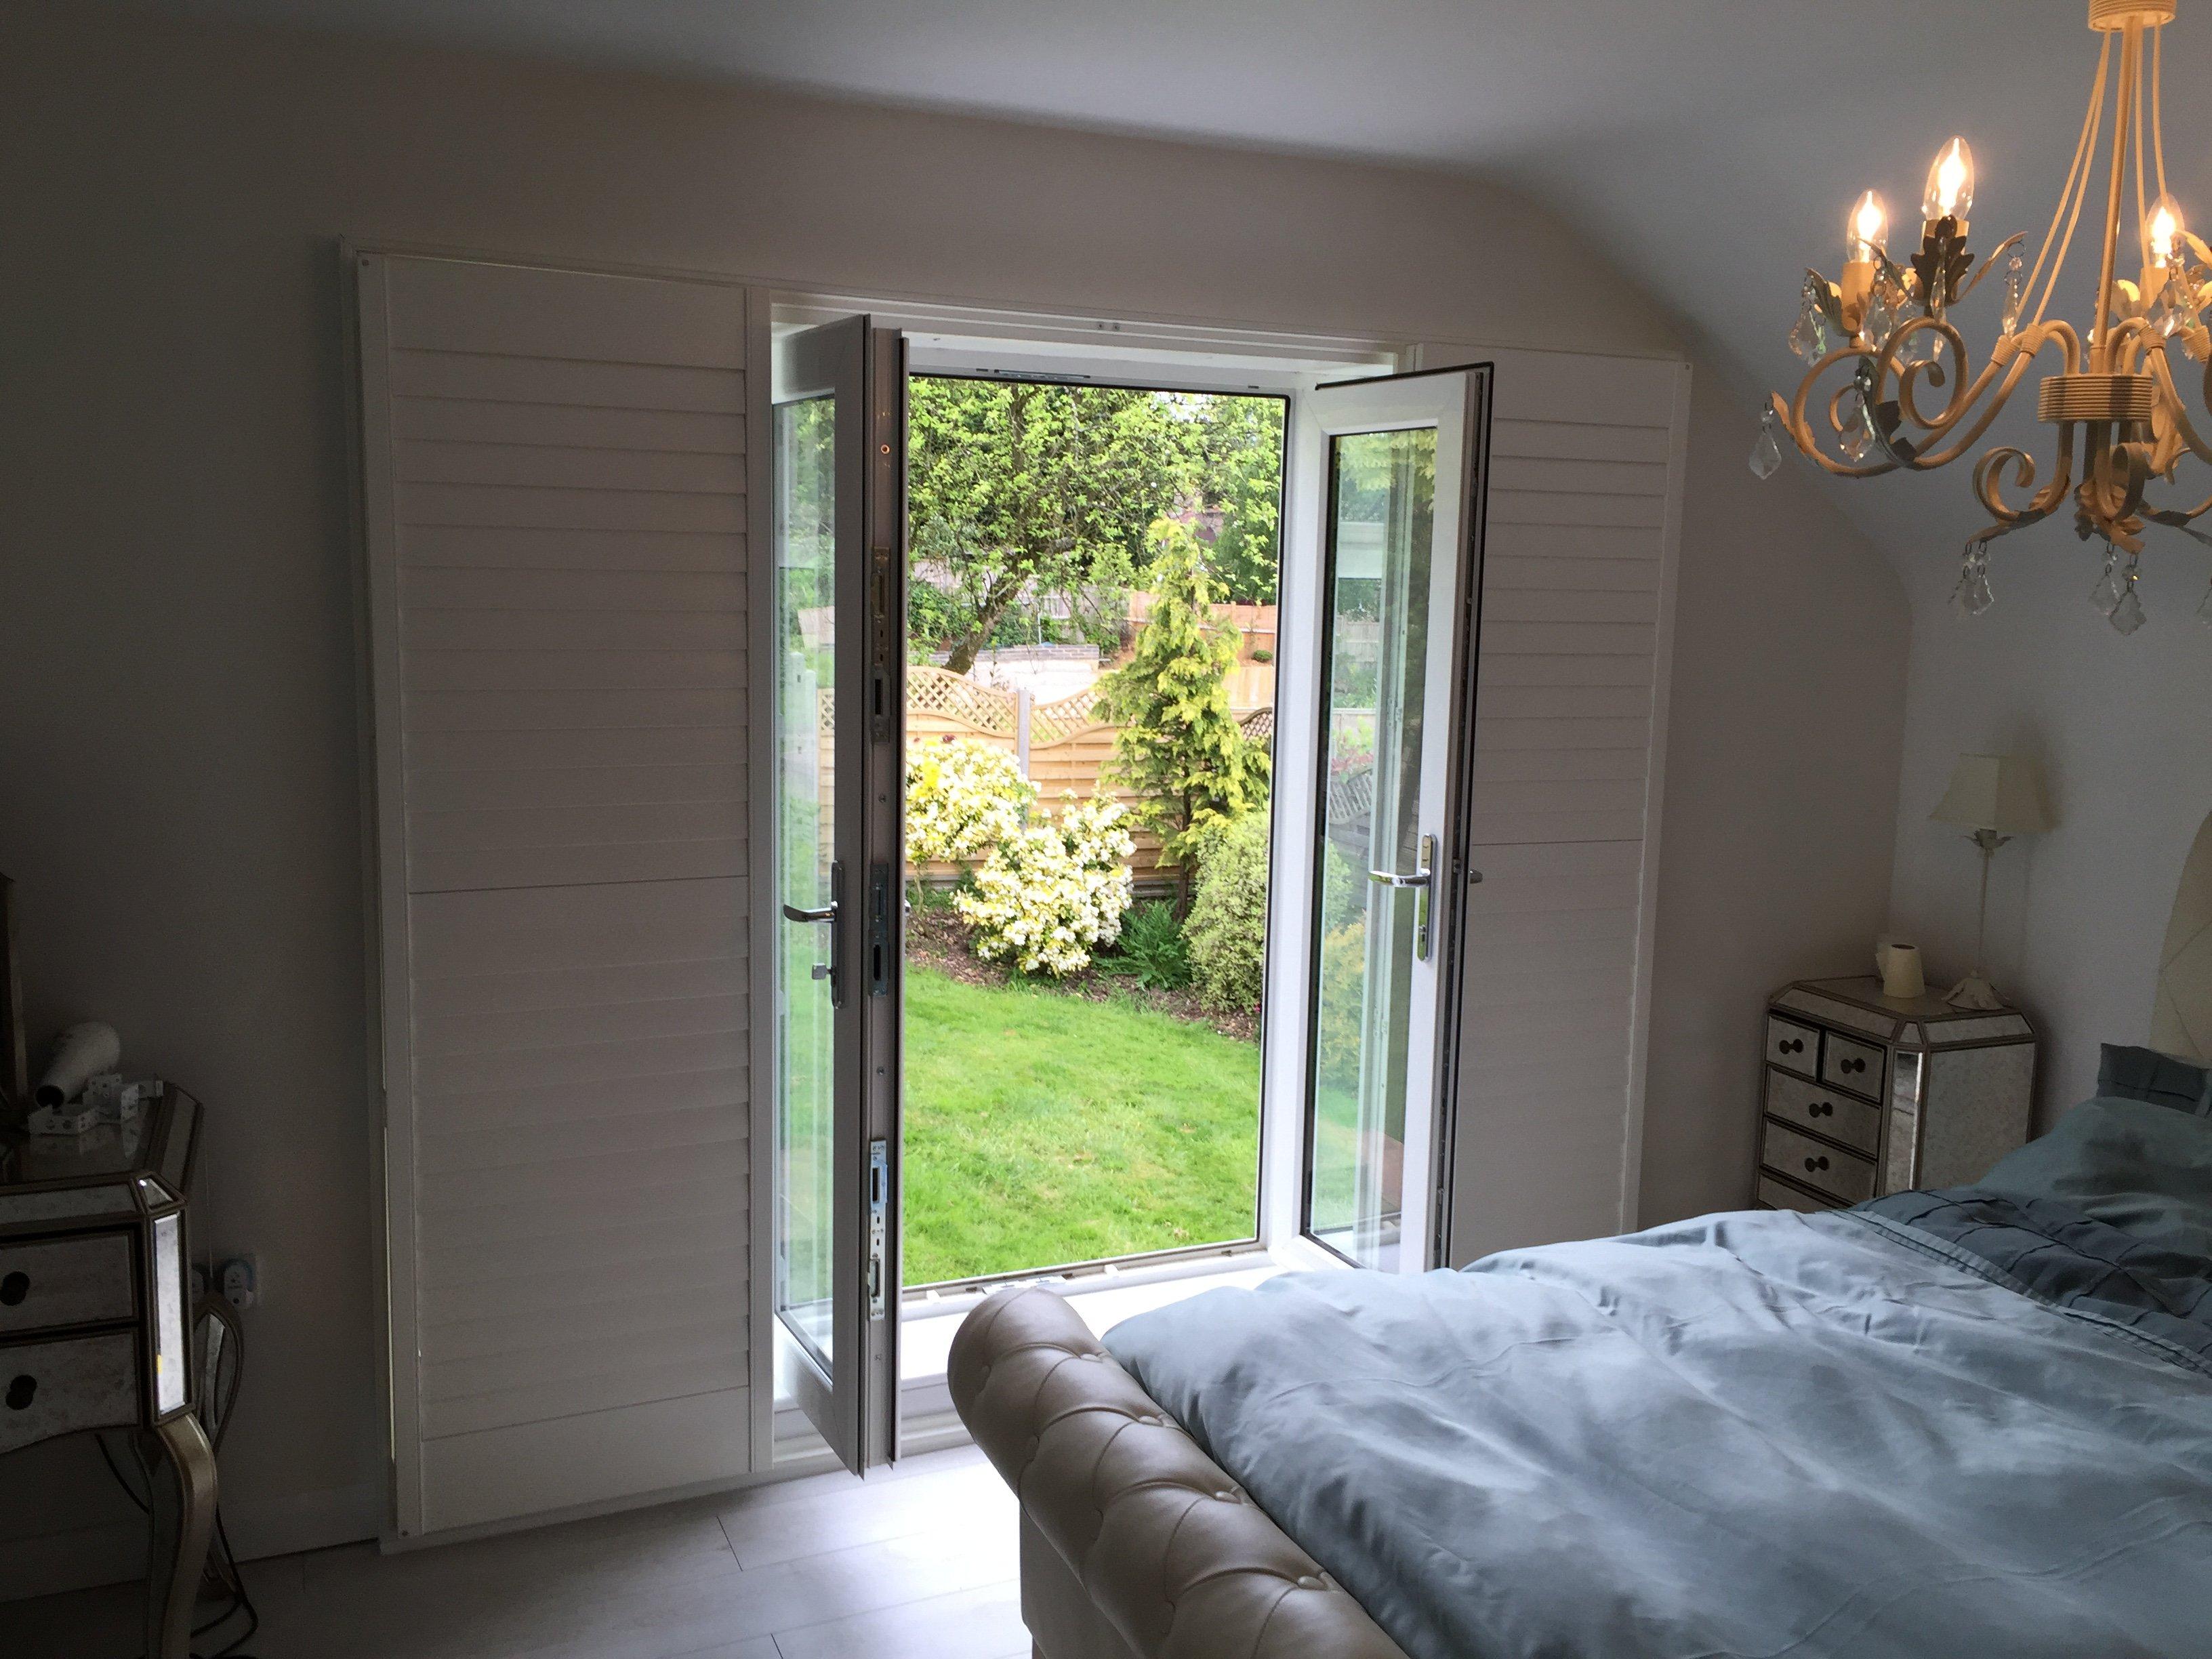 Full height window shutters on pation door leading into garden